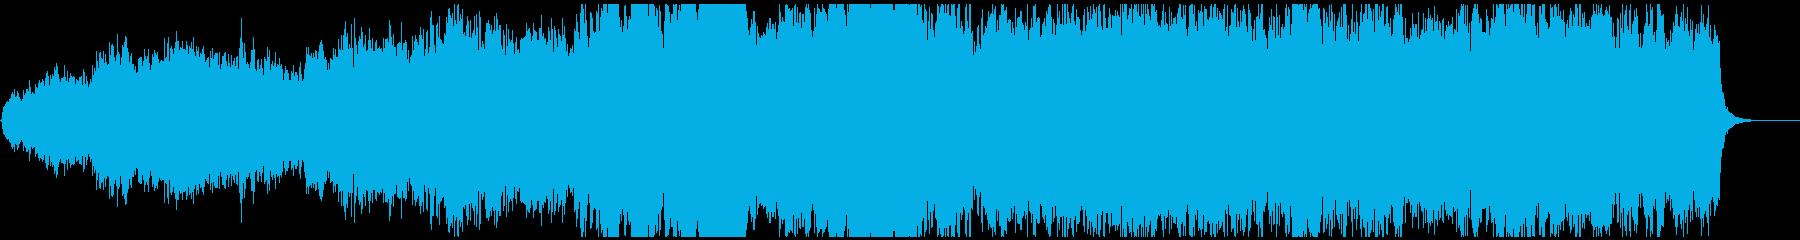 Cosmos Iの再生済みの波形